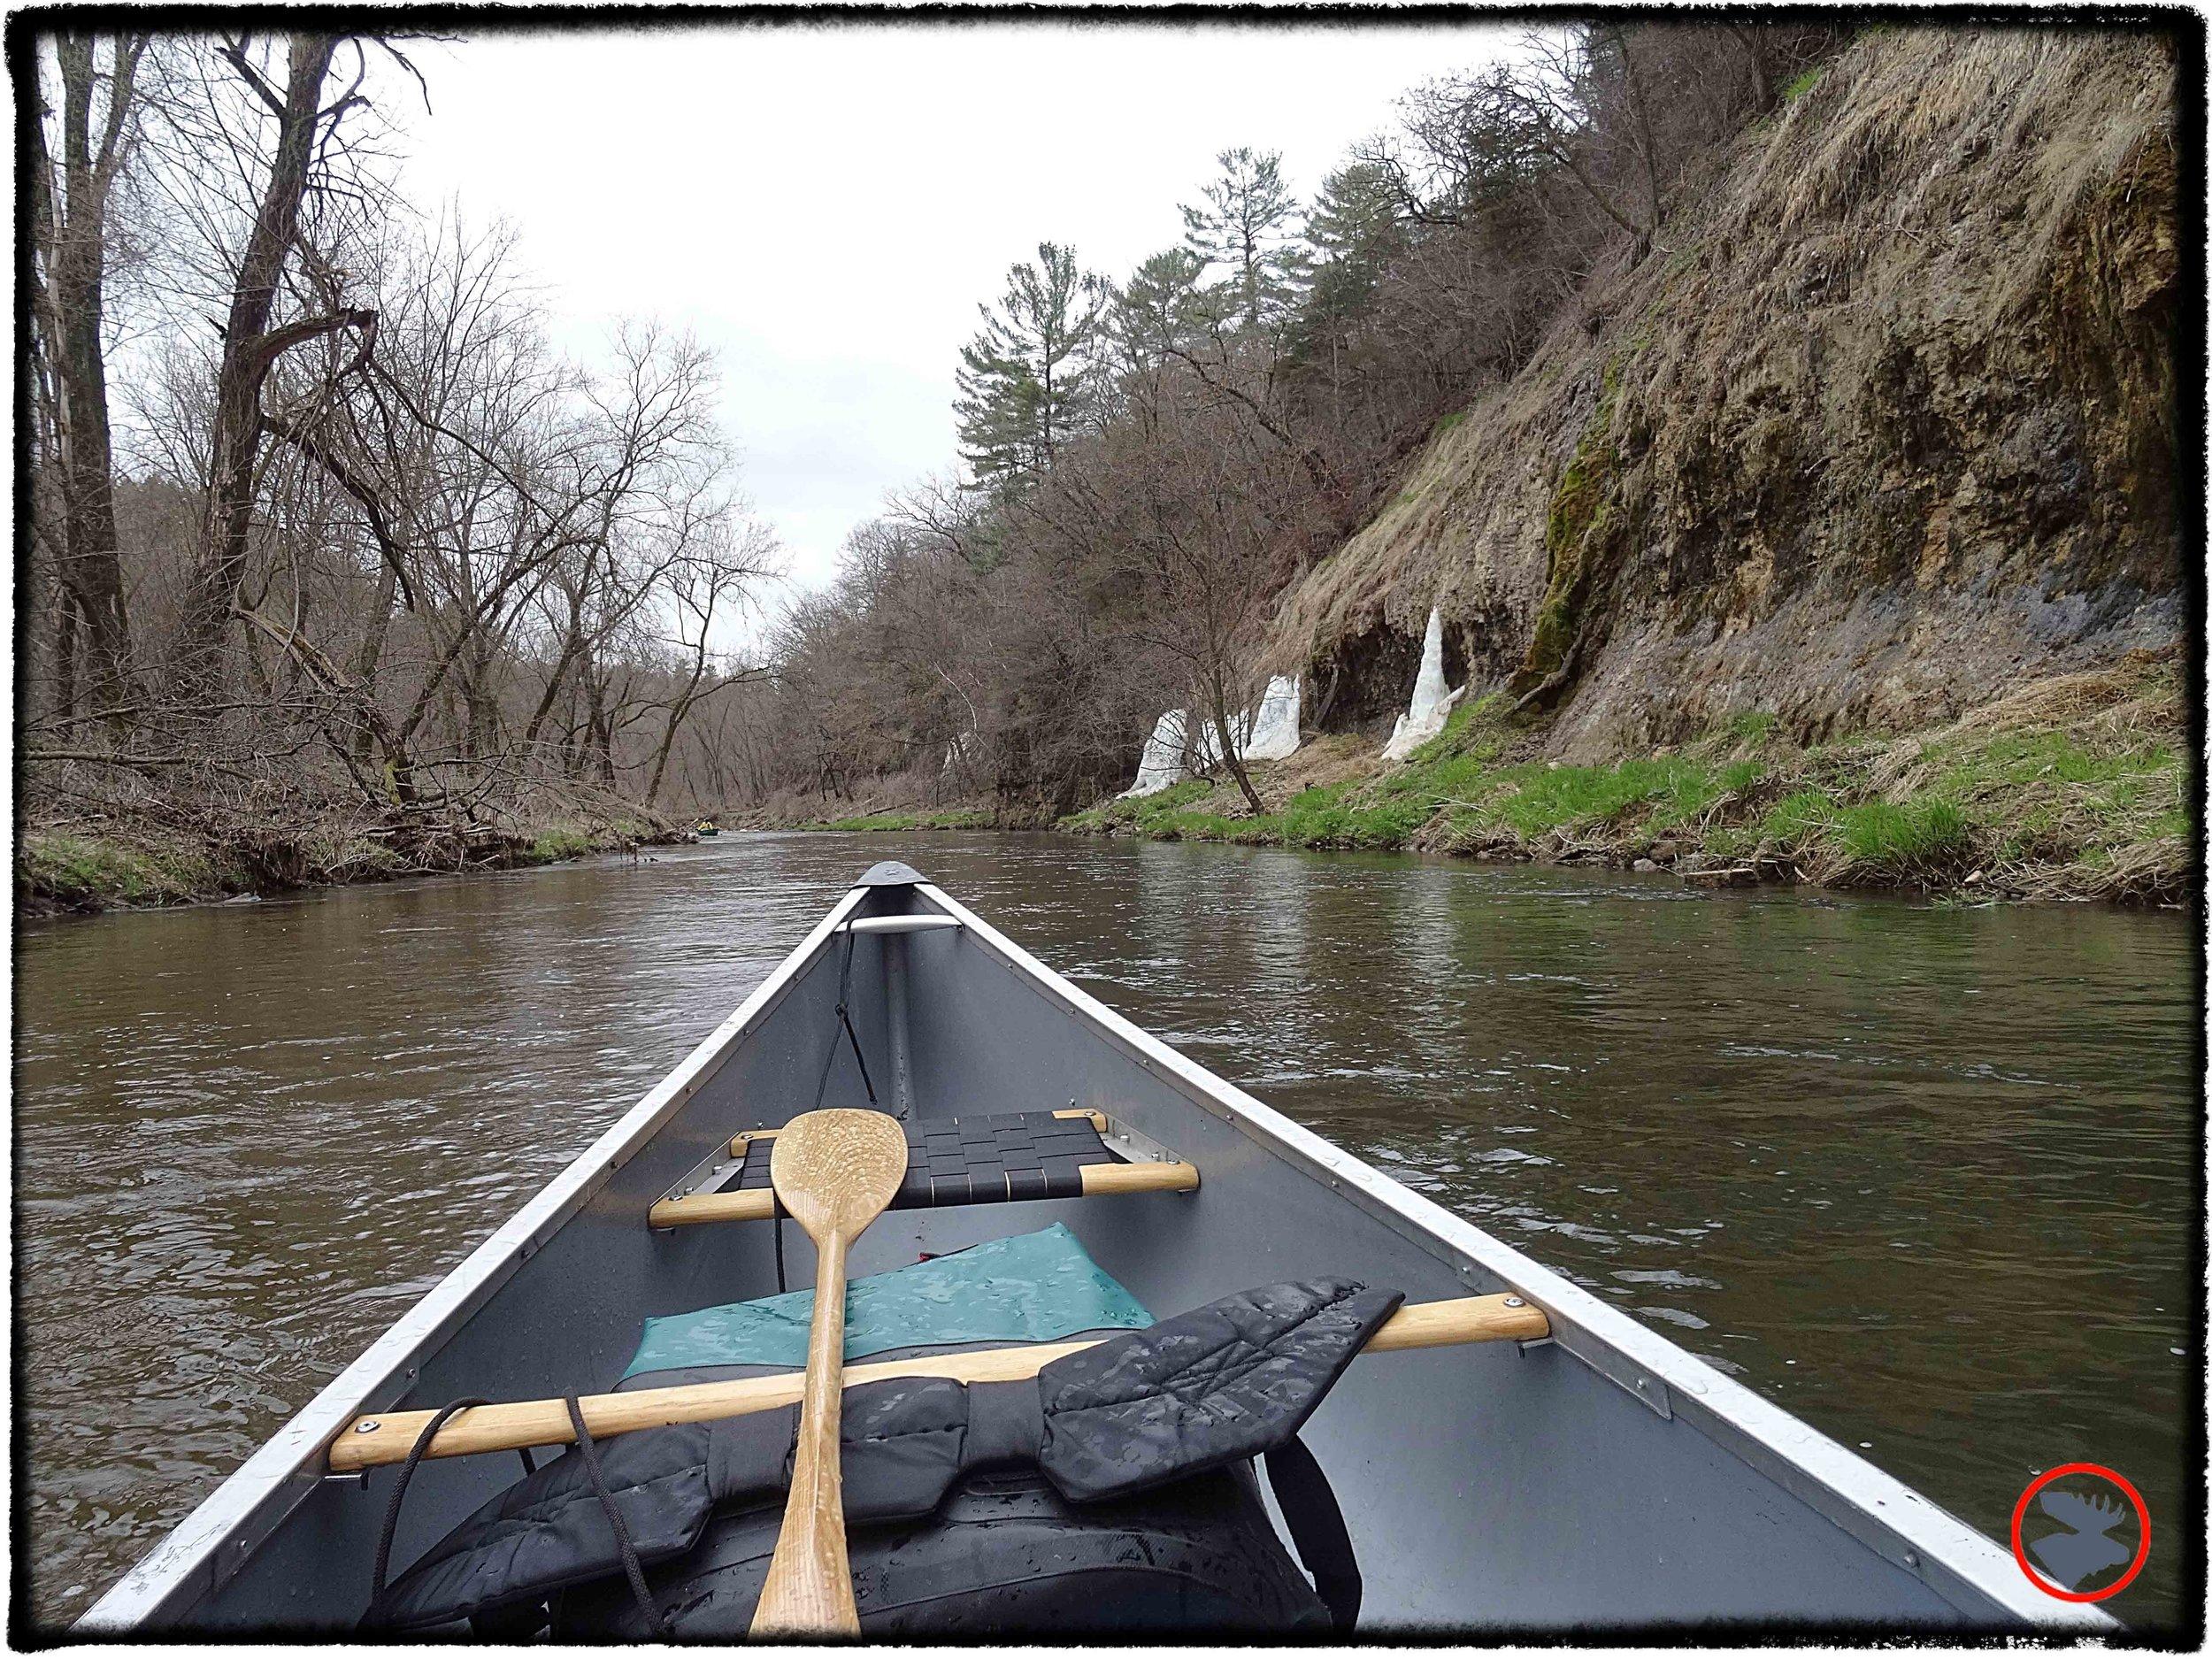 BMP-Post_Kinnickinnic-River_Canoe-Down-the-River_May-2014.jpg